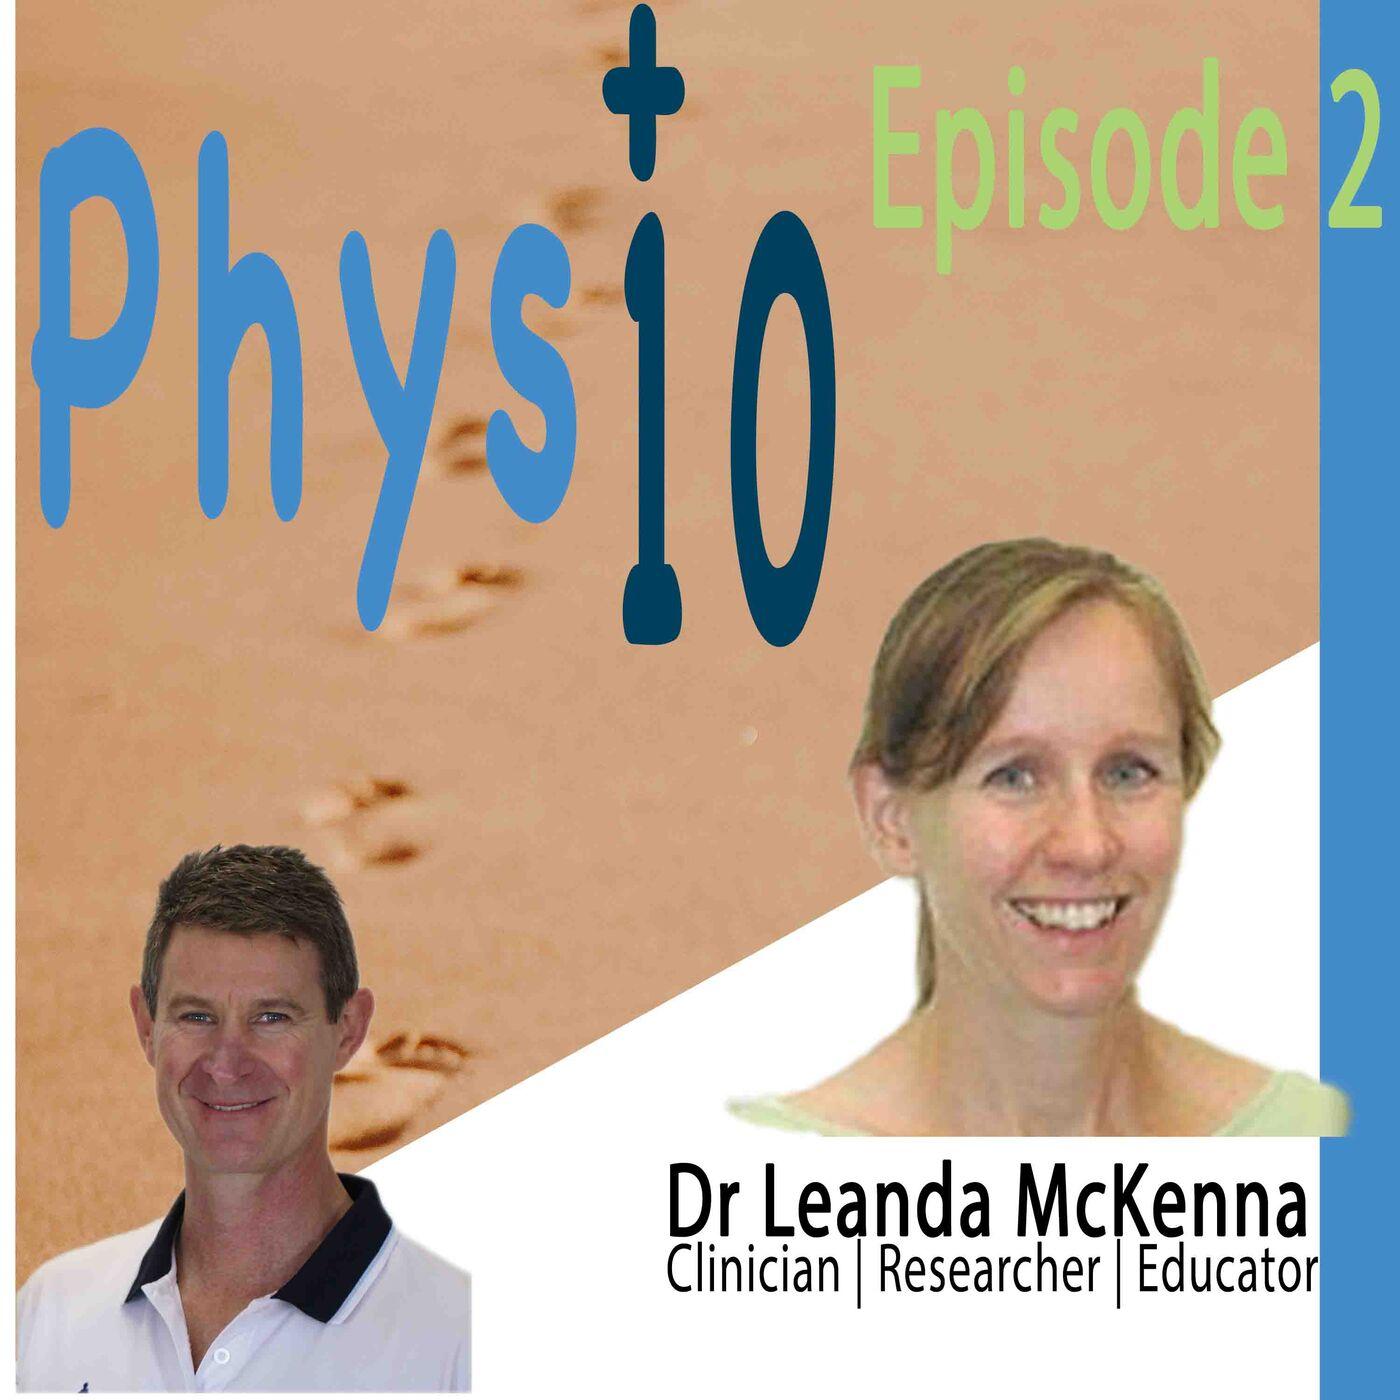 Dr Leanda McKenna: Clinician | Researcher | Educator